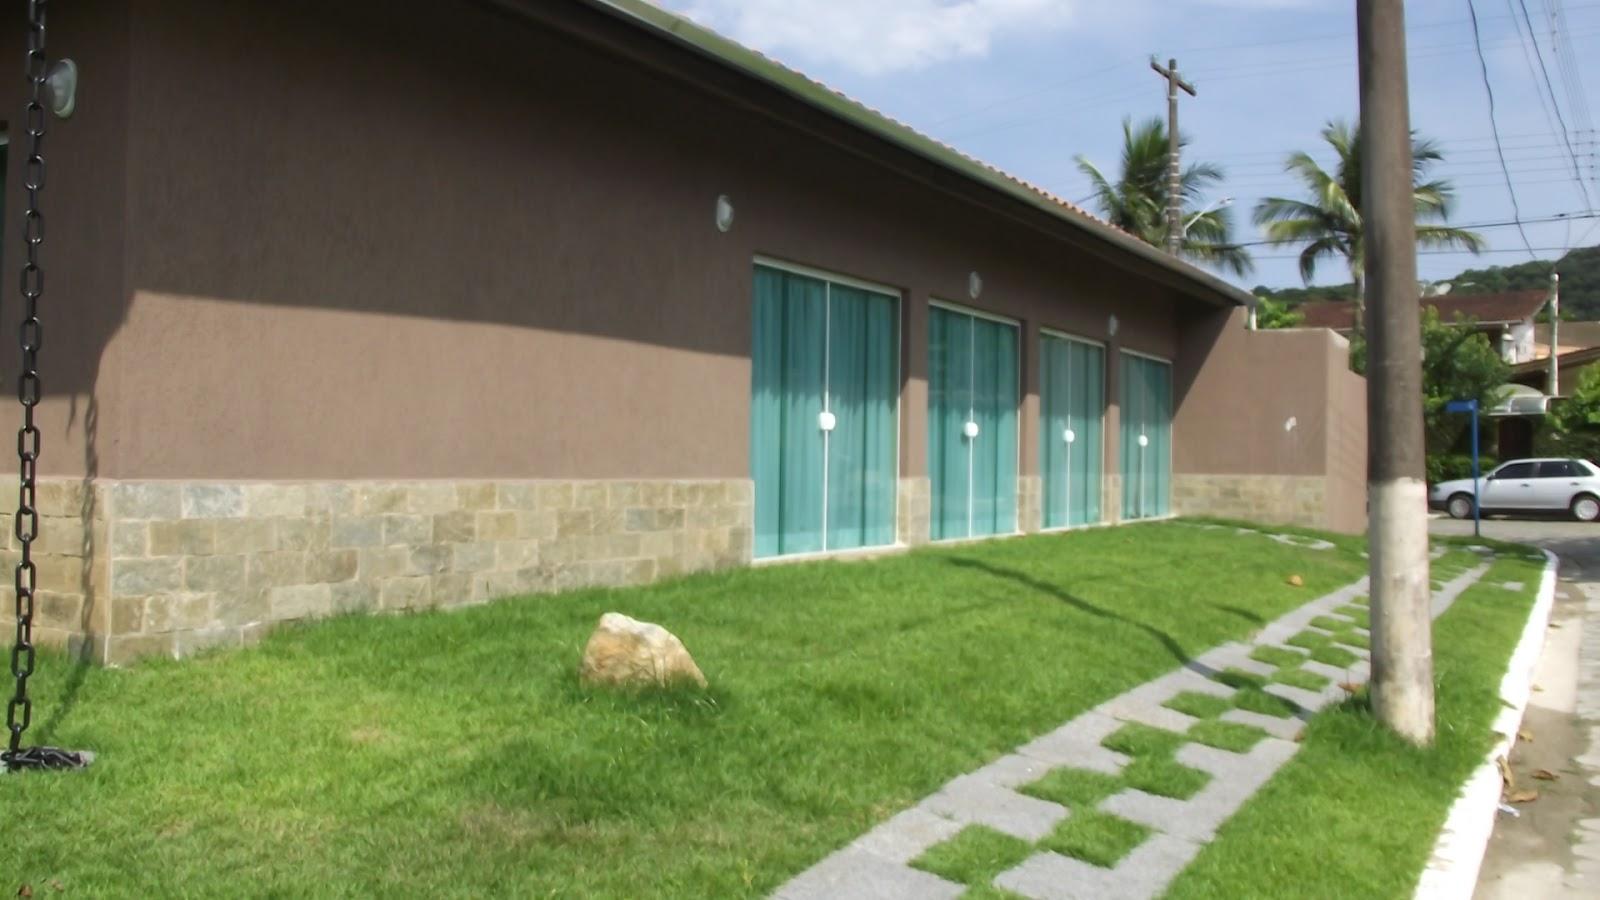 foto da fachada #6E8C3F 1600x900 Banheiro Cachorro Grama